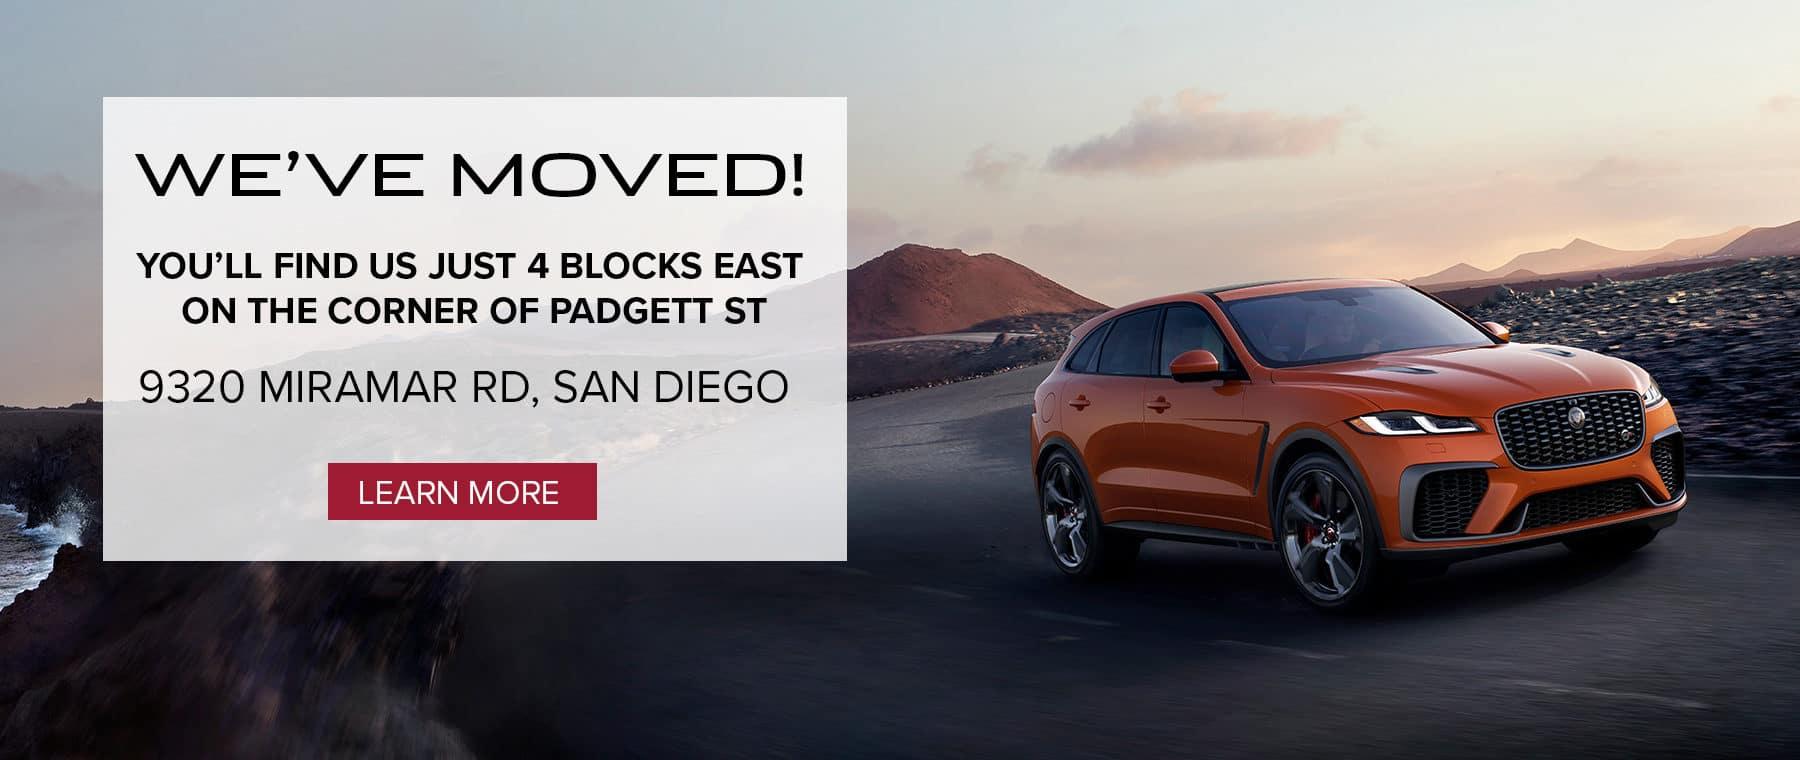 The location of the new Jaguar San Diego dealership location with an orange Jaguar